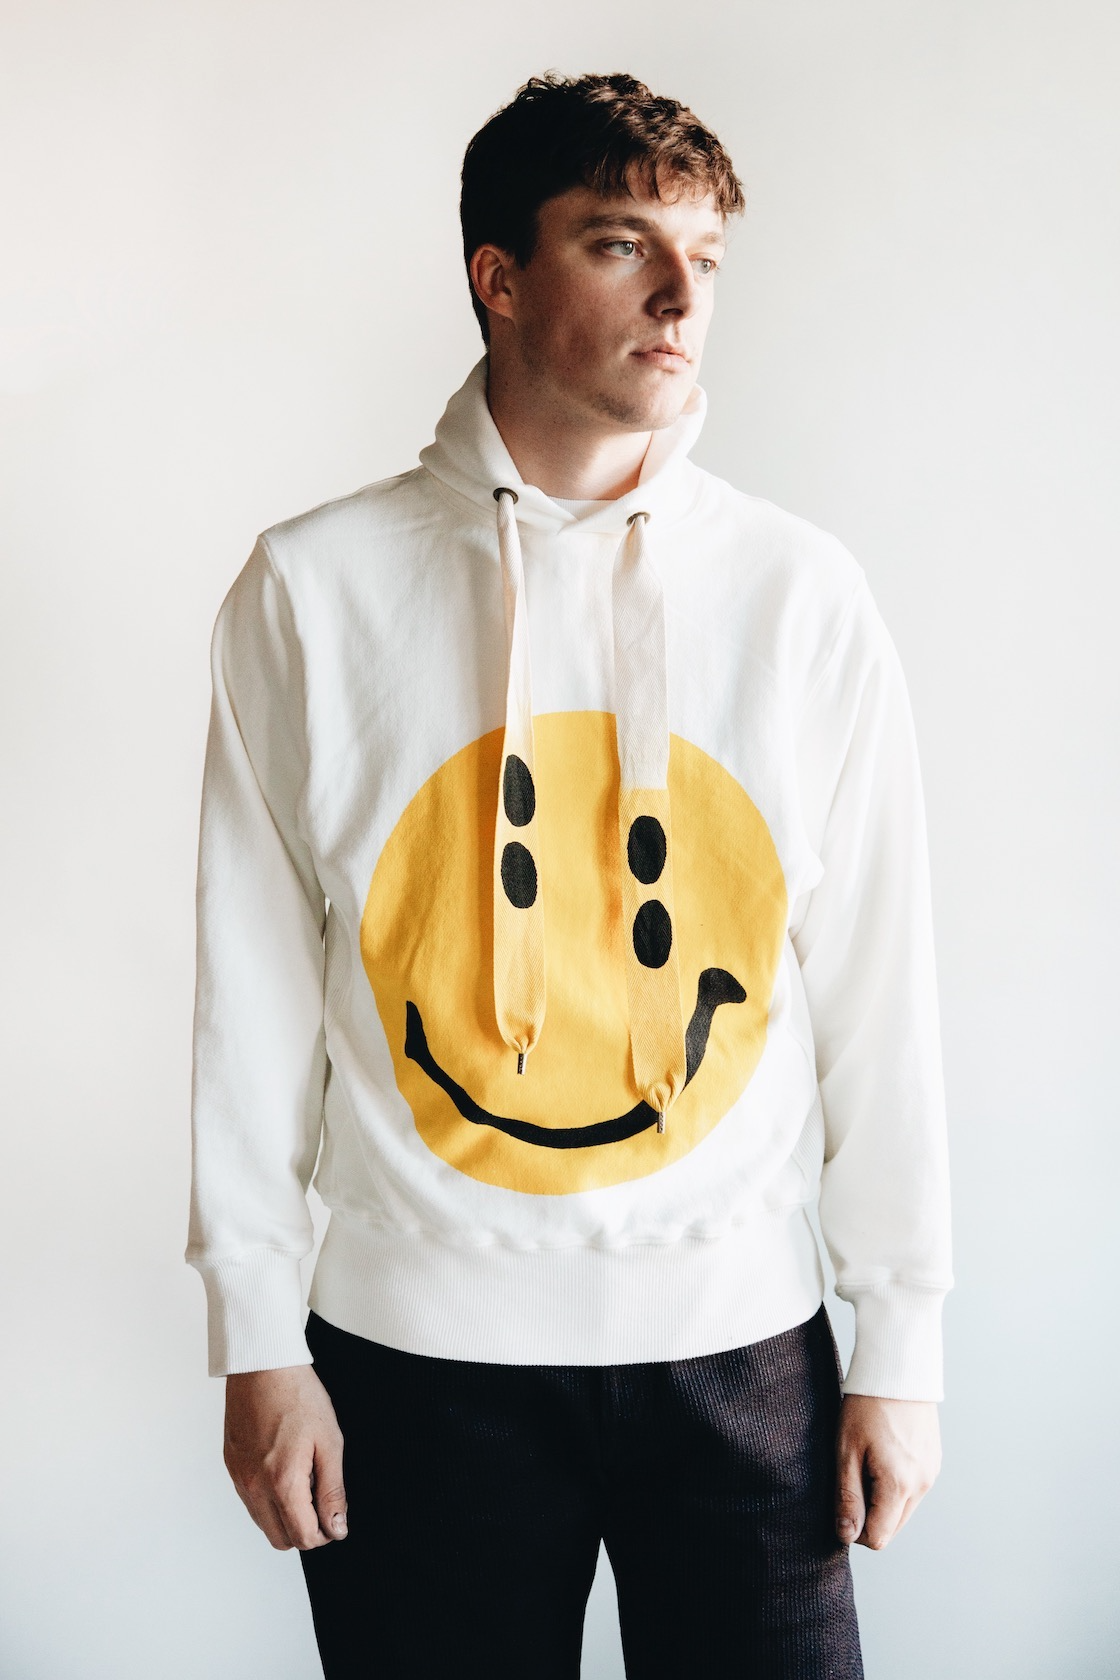 kapital kountry clothing japan smiley sweatshirt on body